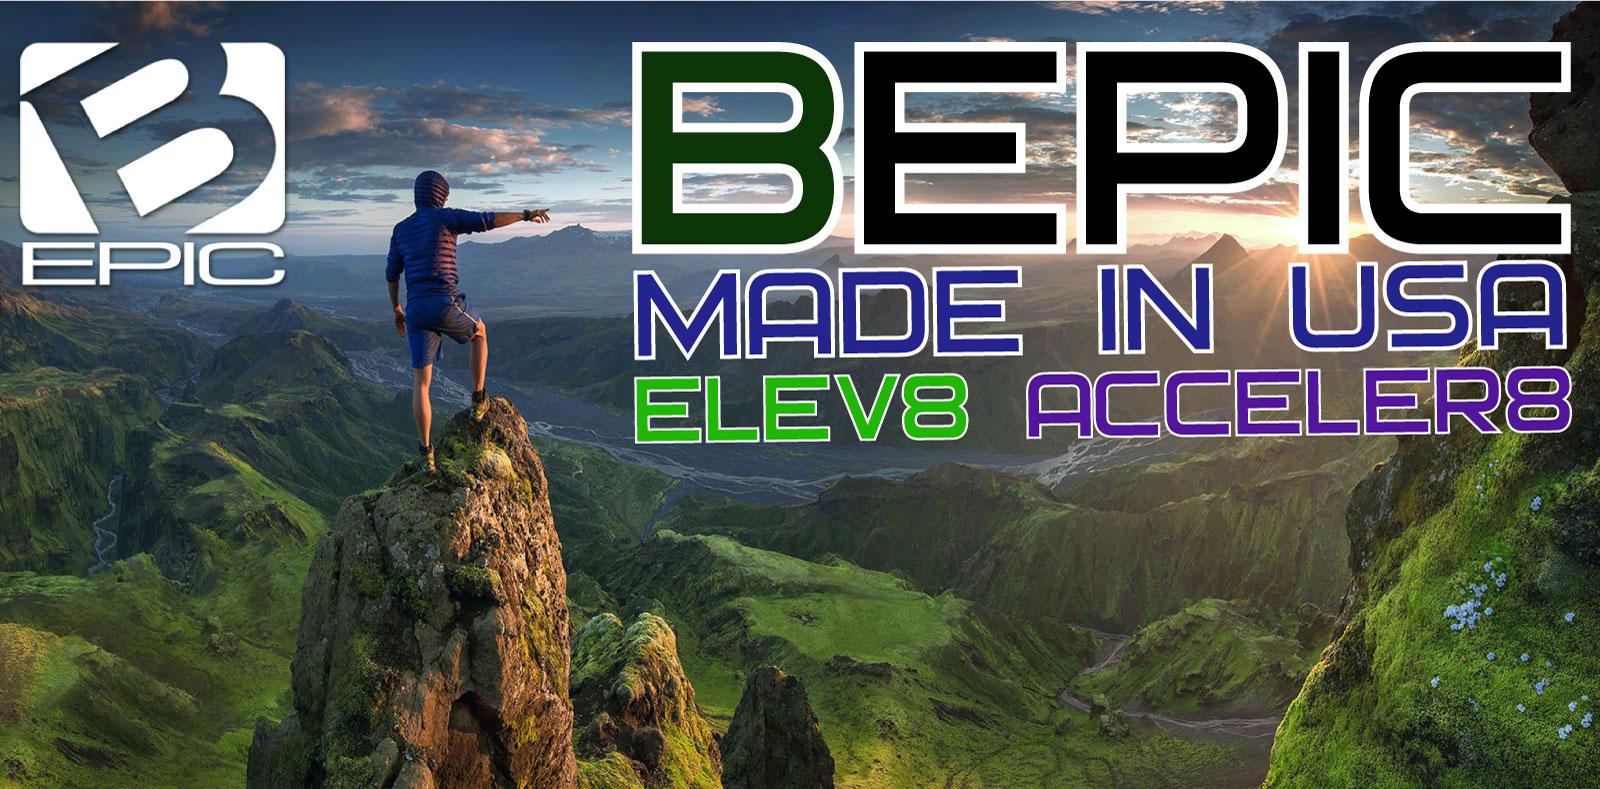 bepic elev8